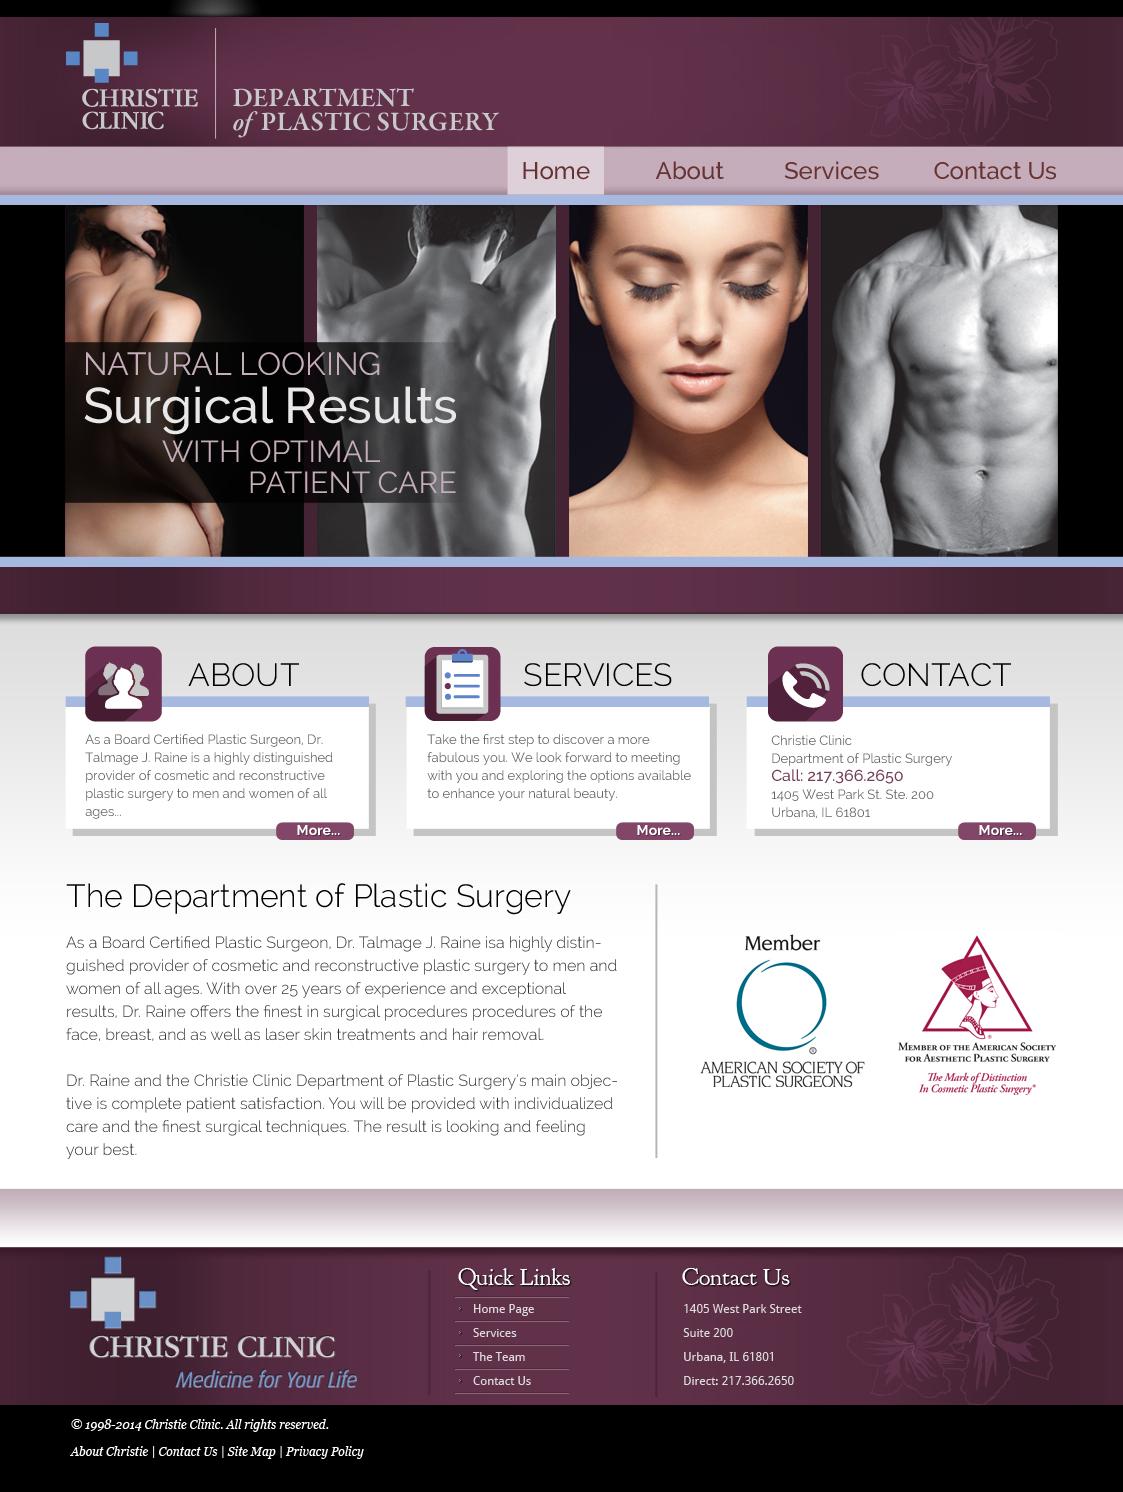 16-Plastic-surgery-home.jpg